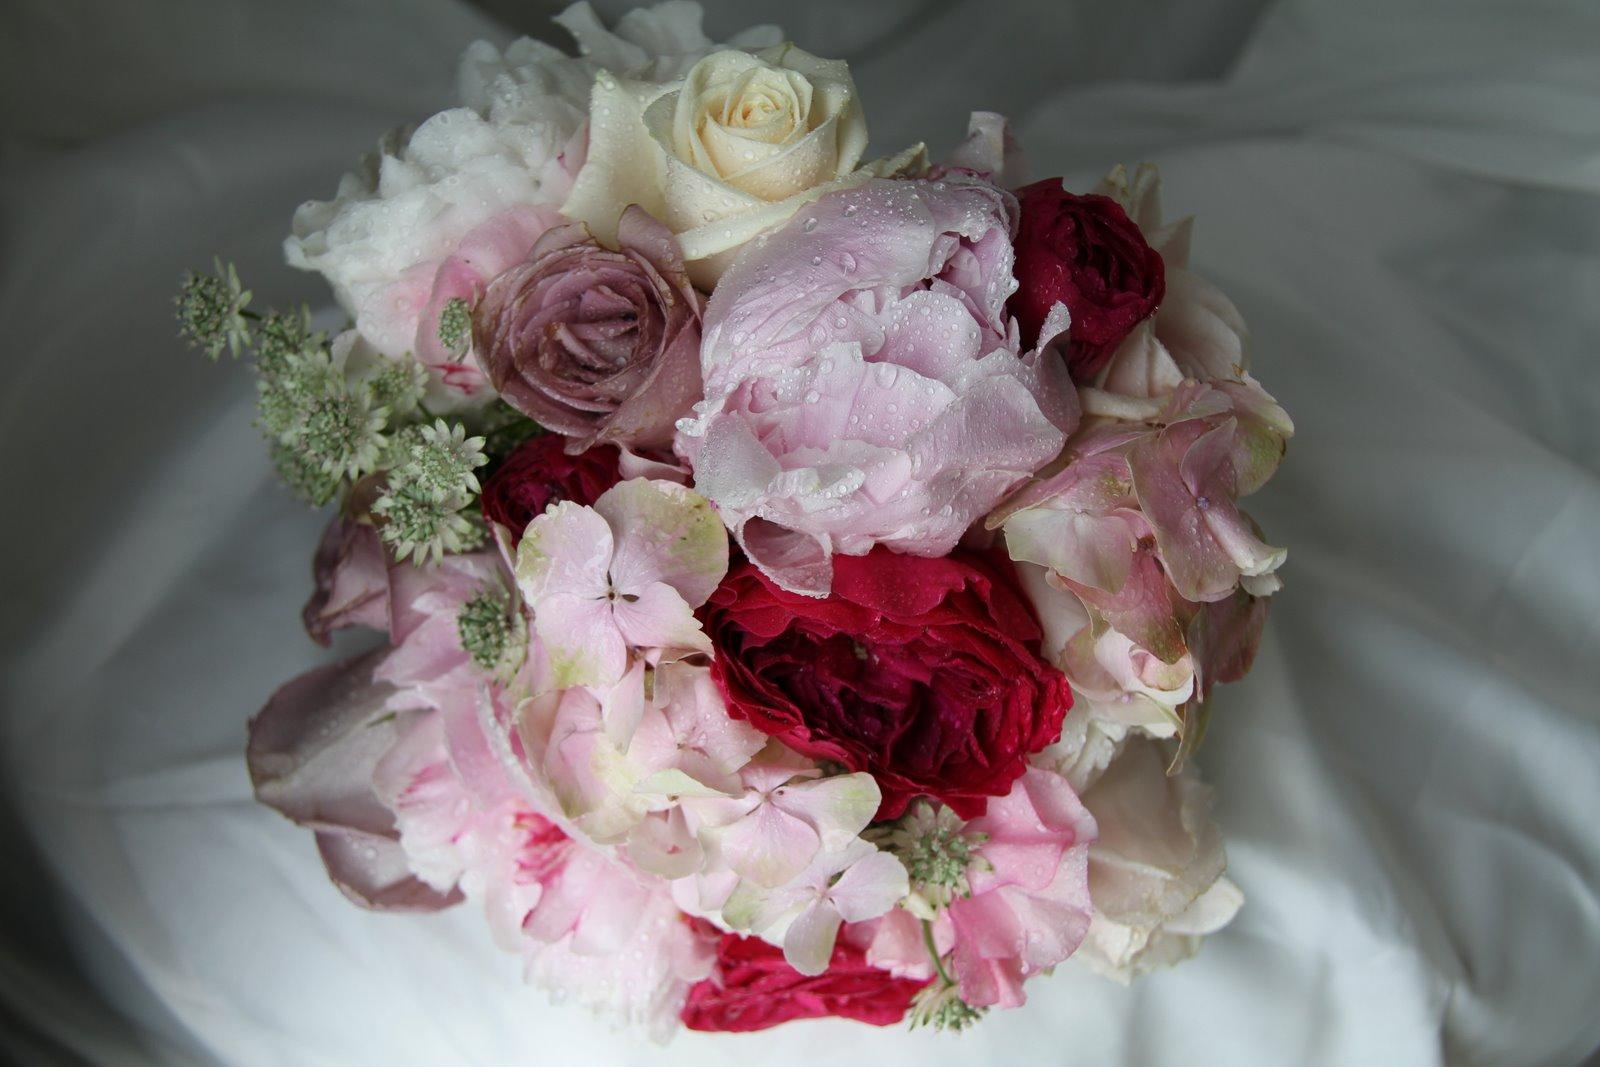 astrantia peony bouquet wedding pink red vintage hydrangea